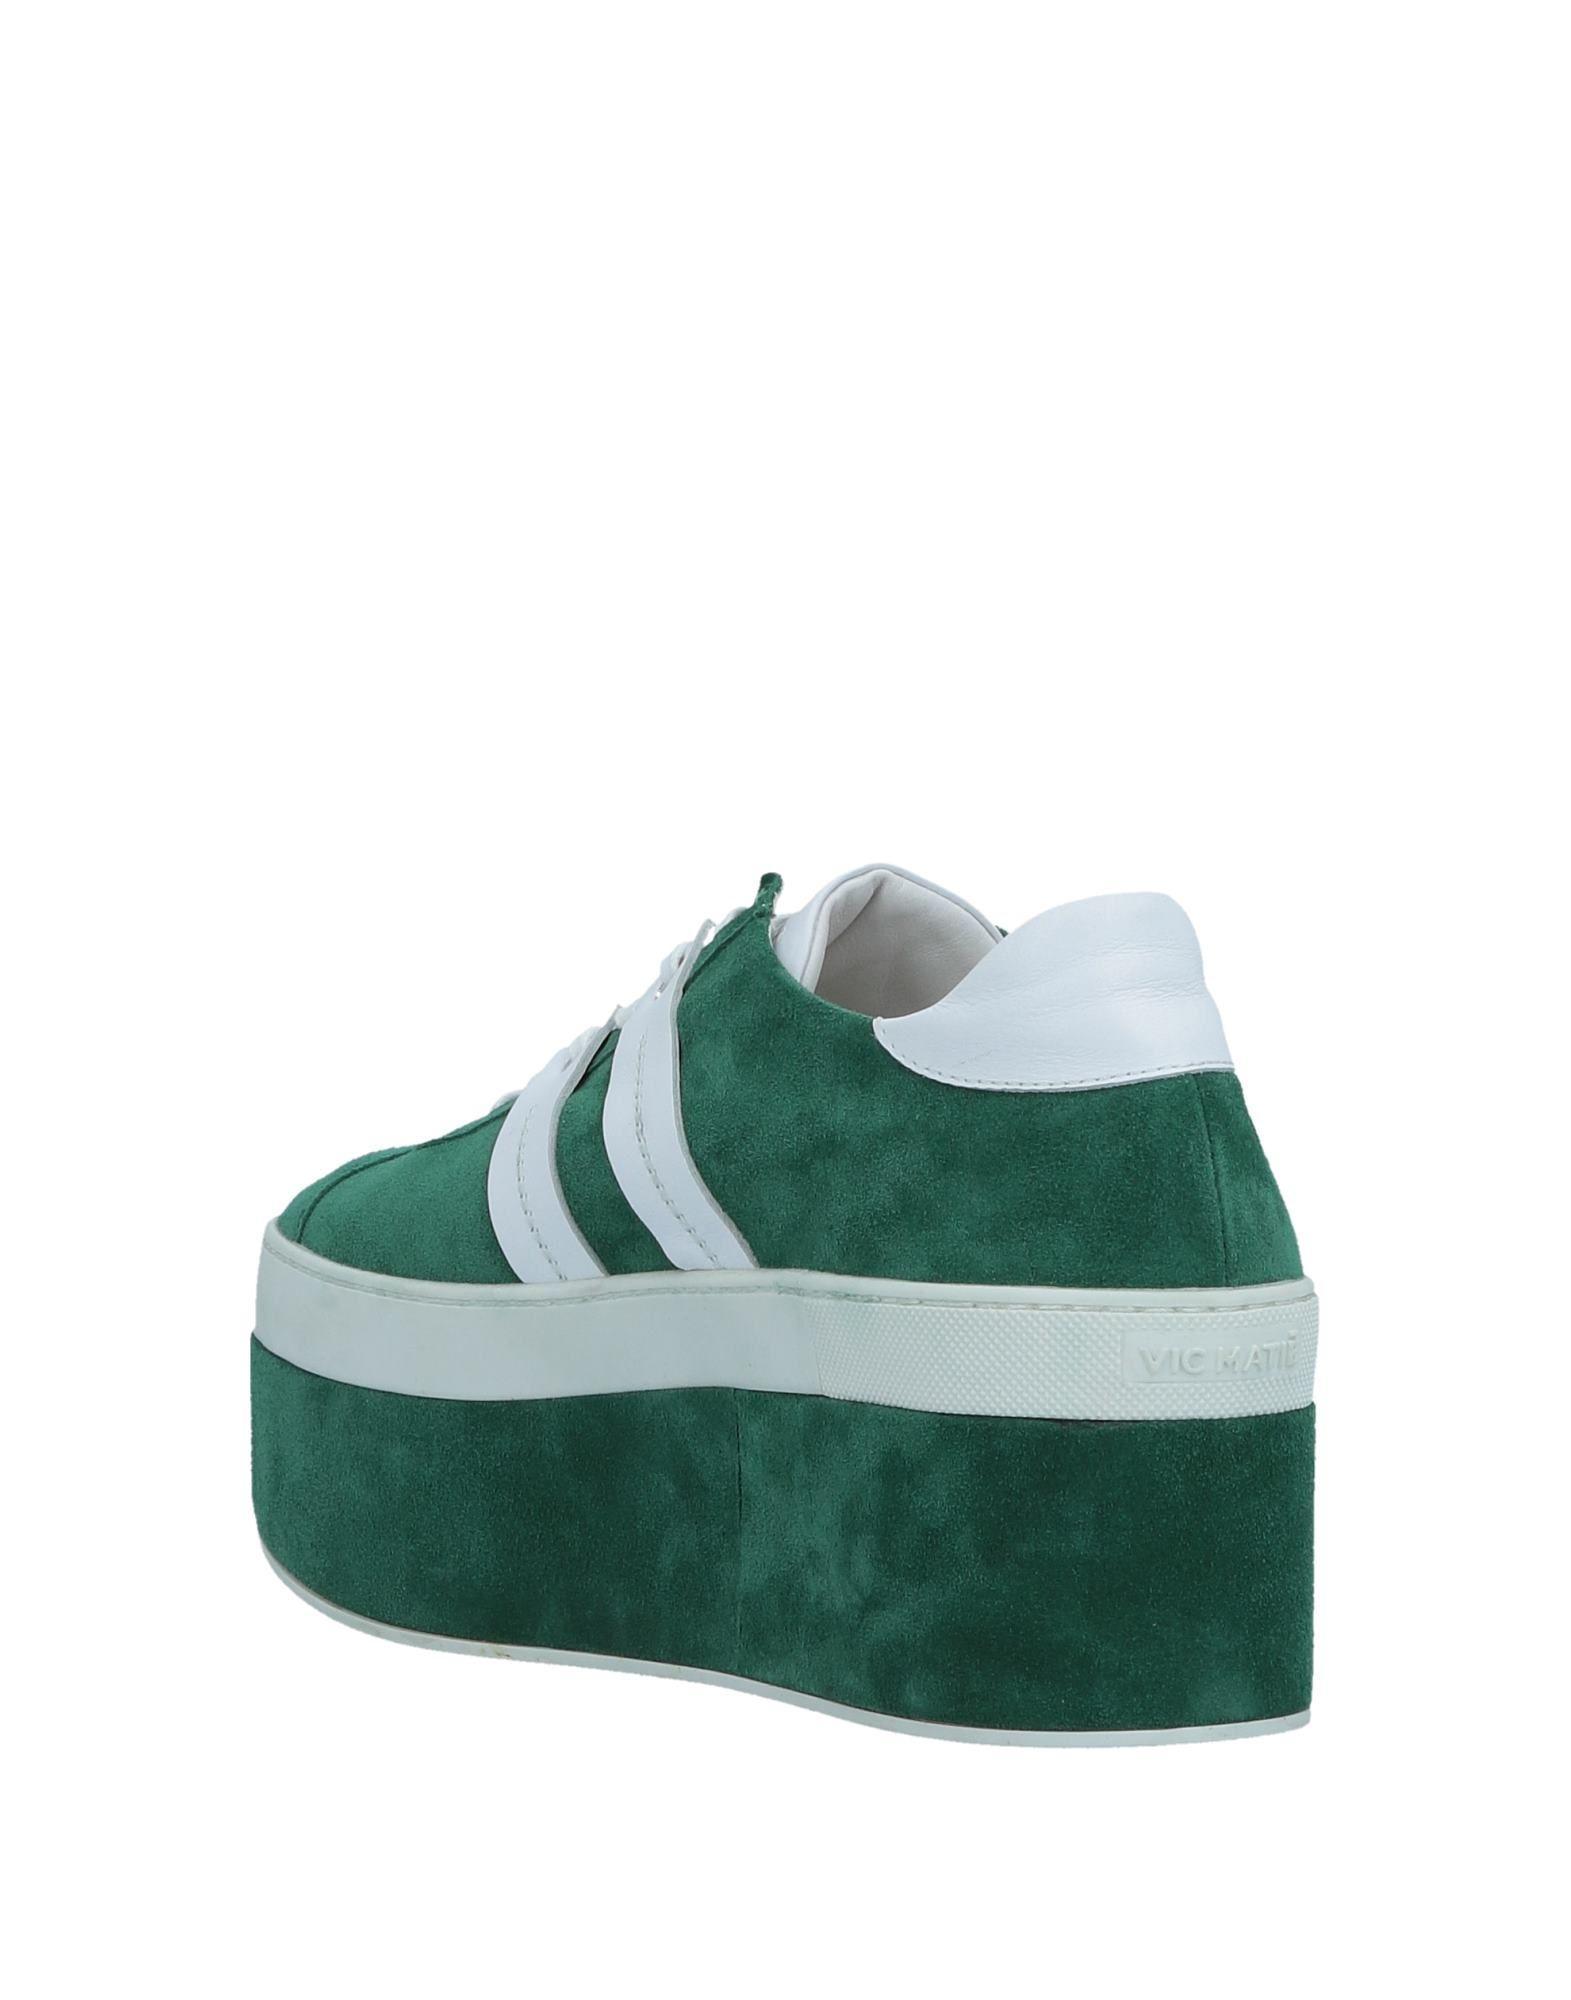 Vic Matié Suede Low-tops & Sneakers in Green